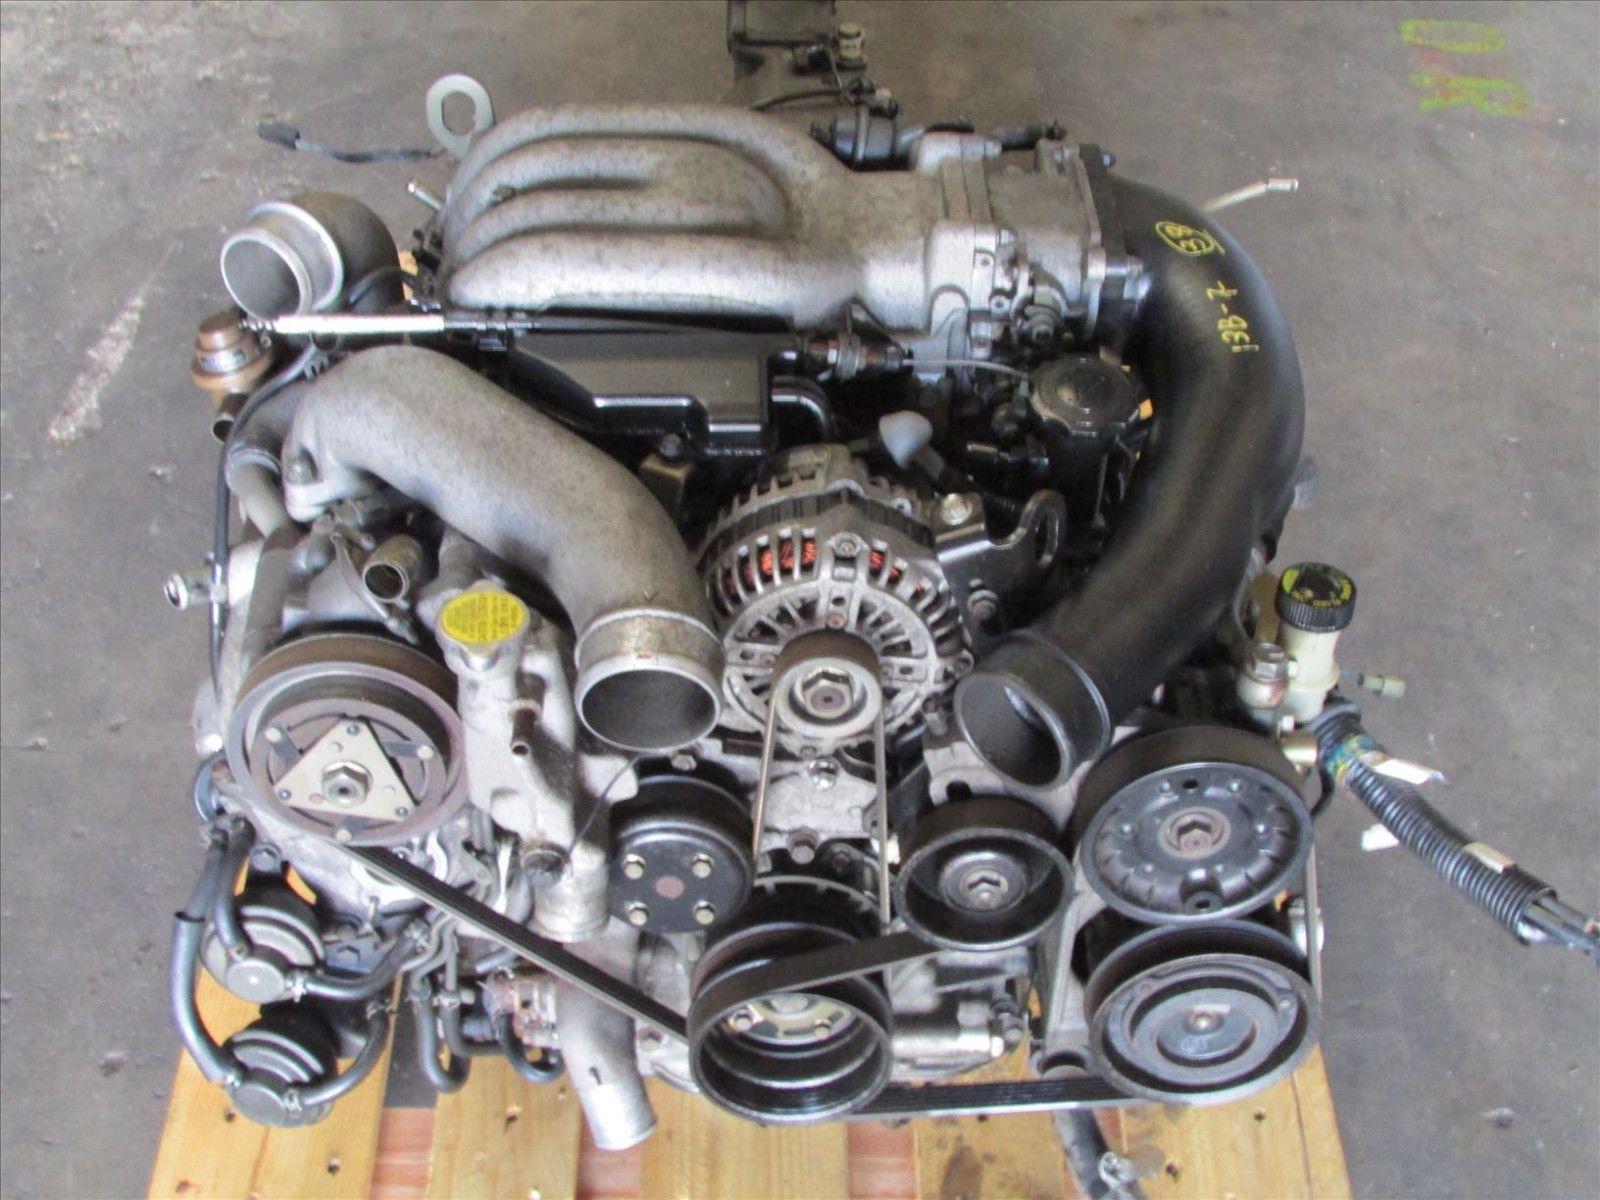 Mazda RX7 FD3S Twin Turbo 13B Rotary Engine 5 Speed Manual